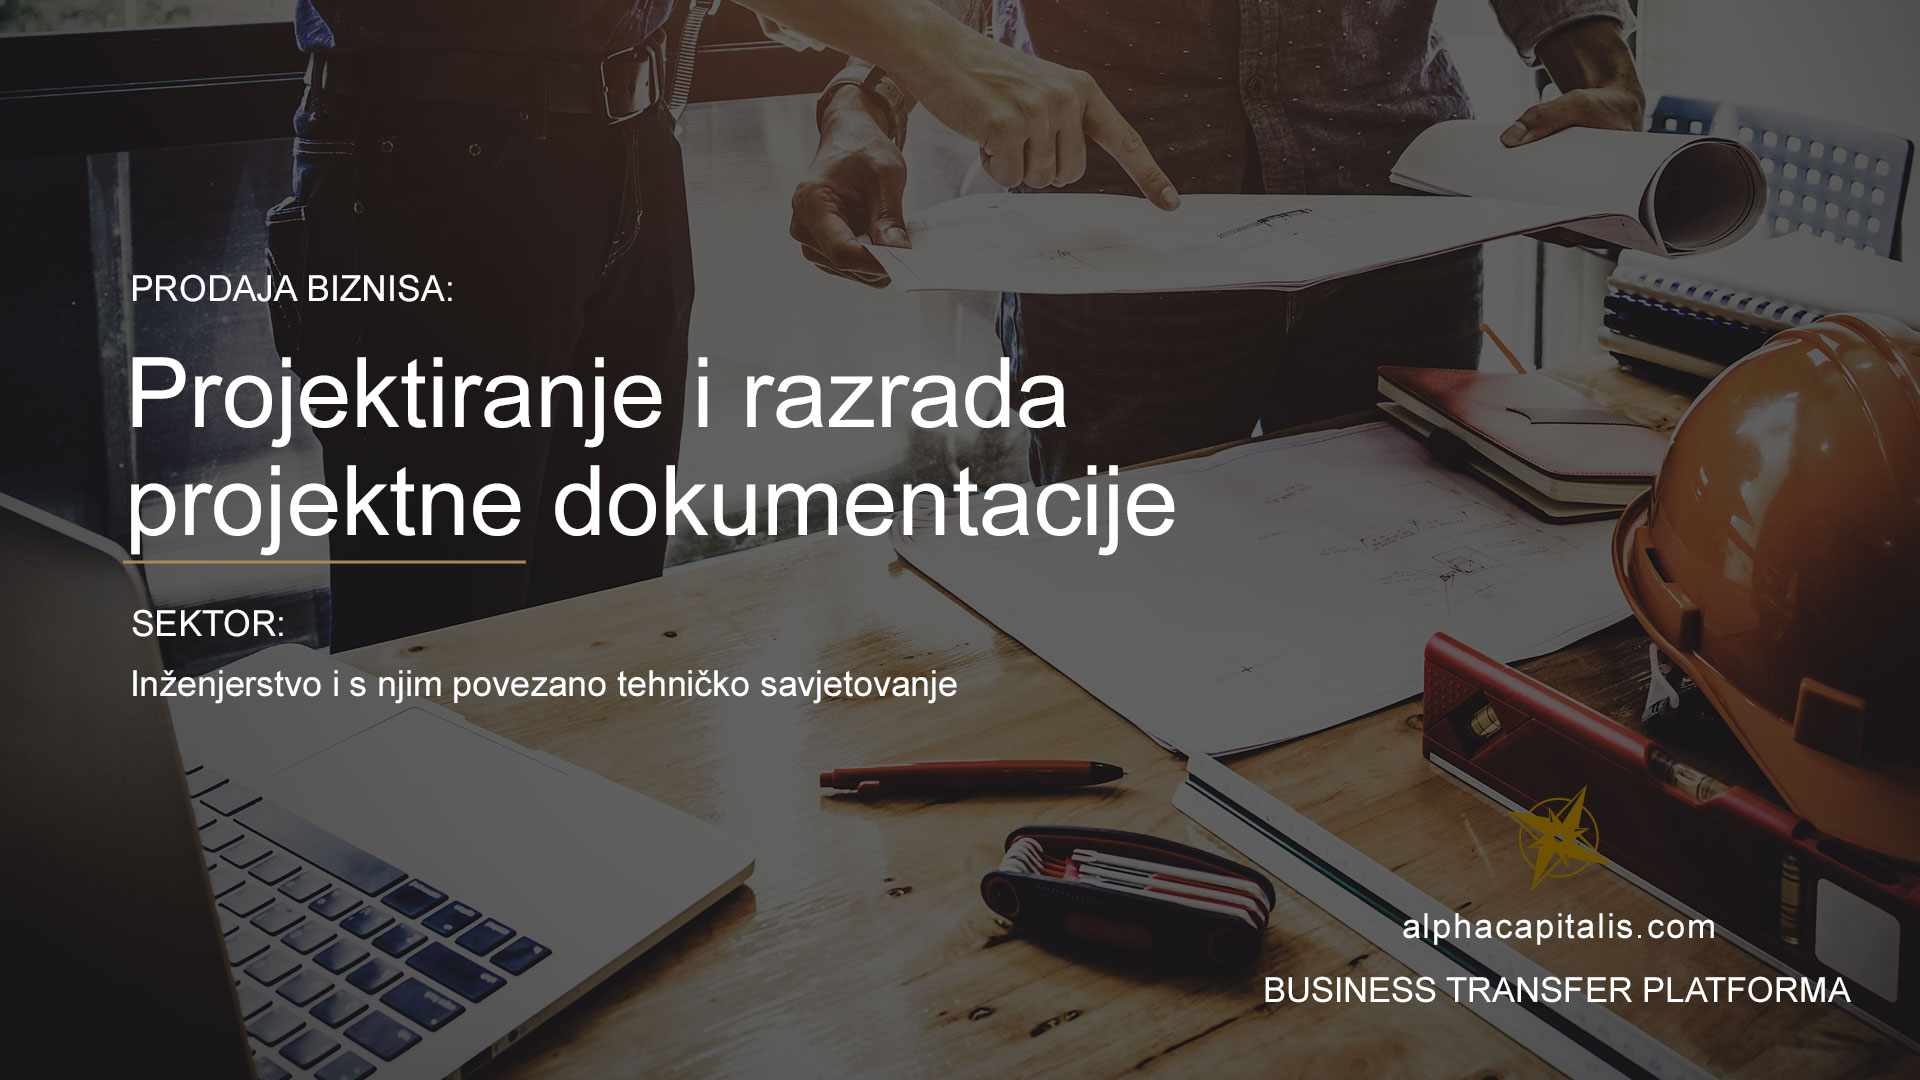 alpha-capitalis-business-transfer-platforma-projektiranje-brodogradnja